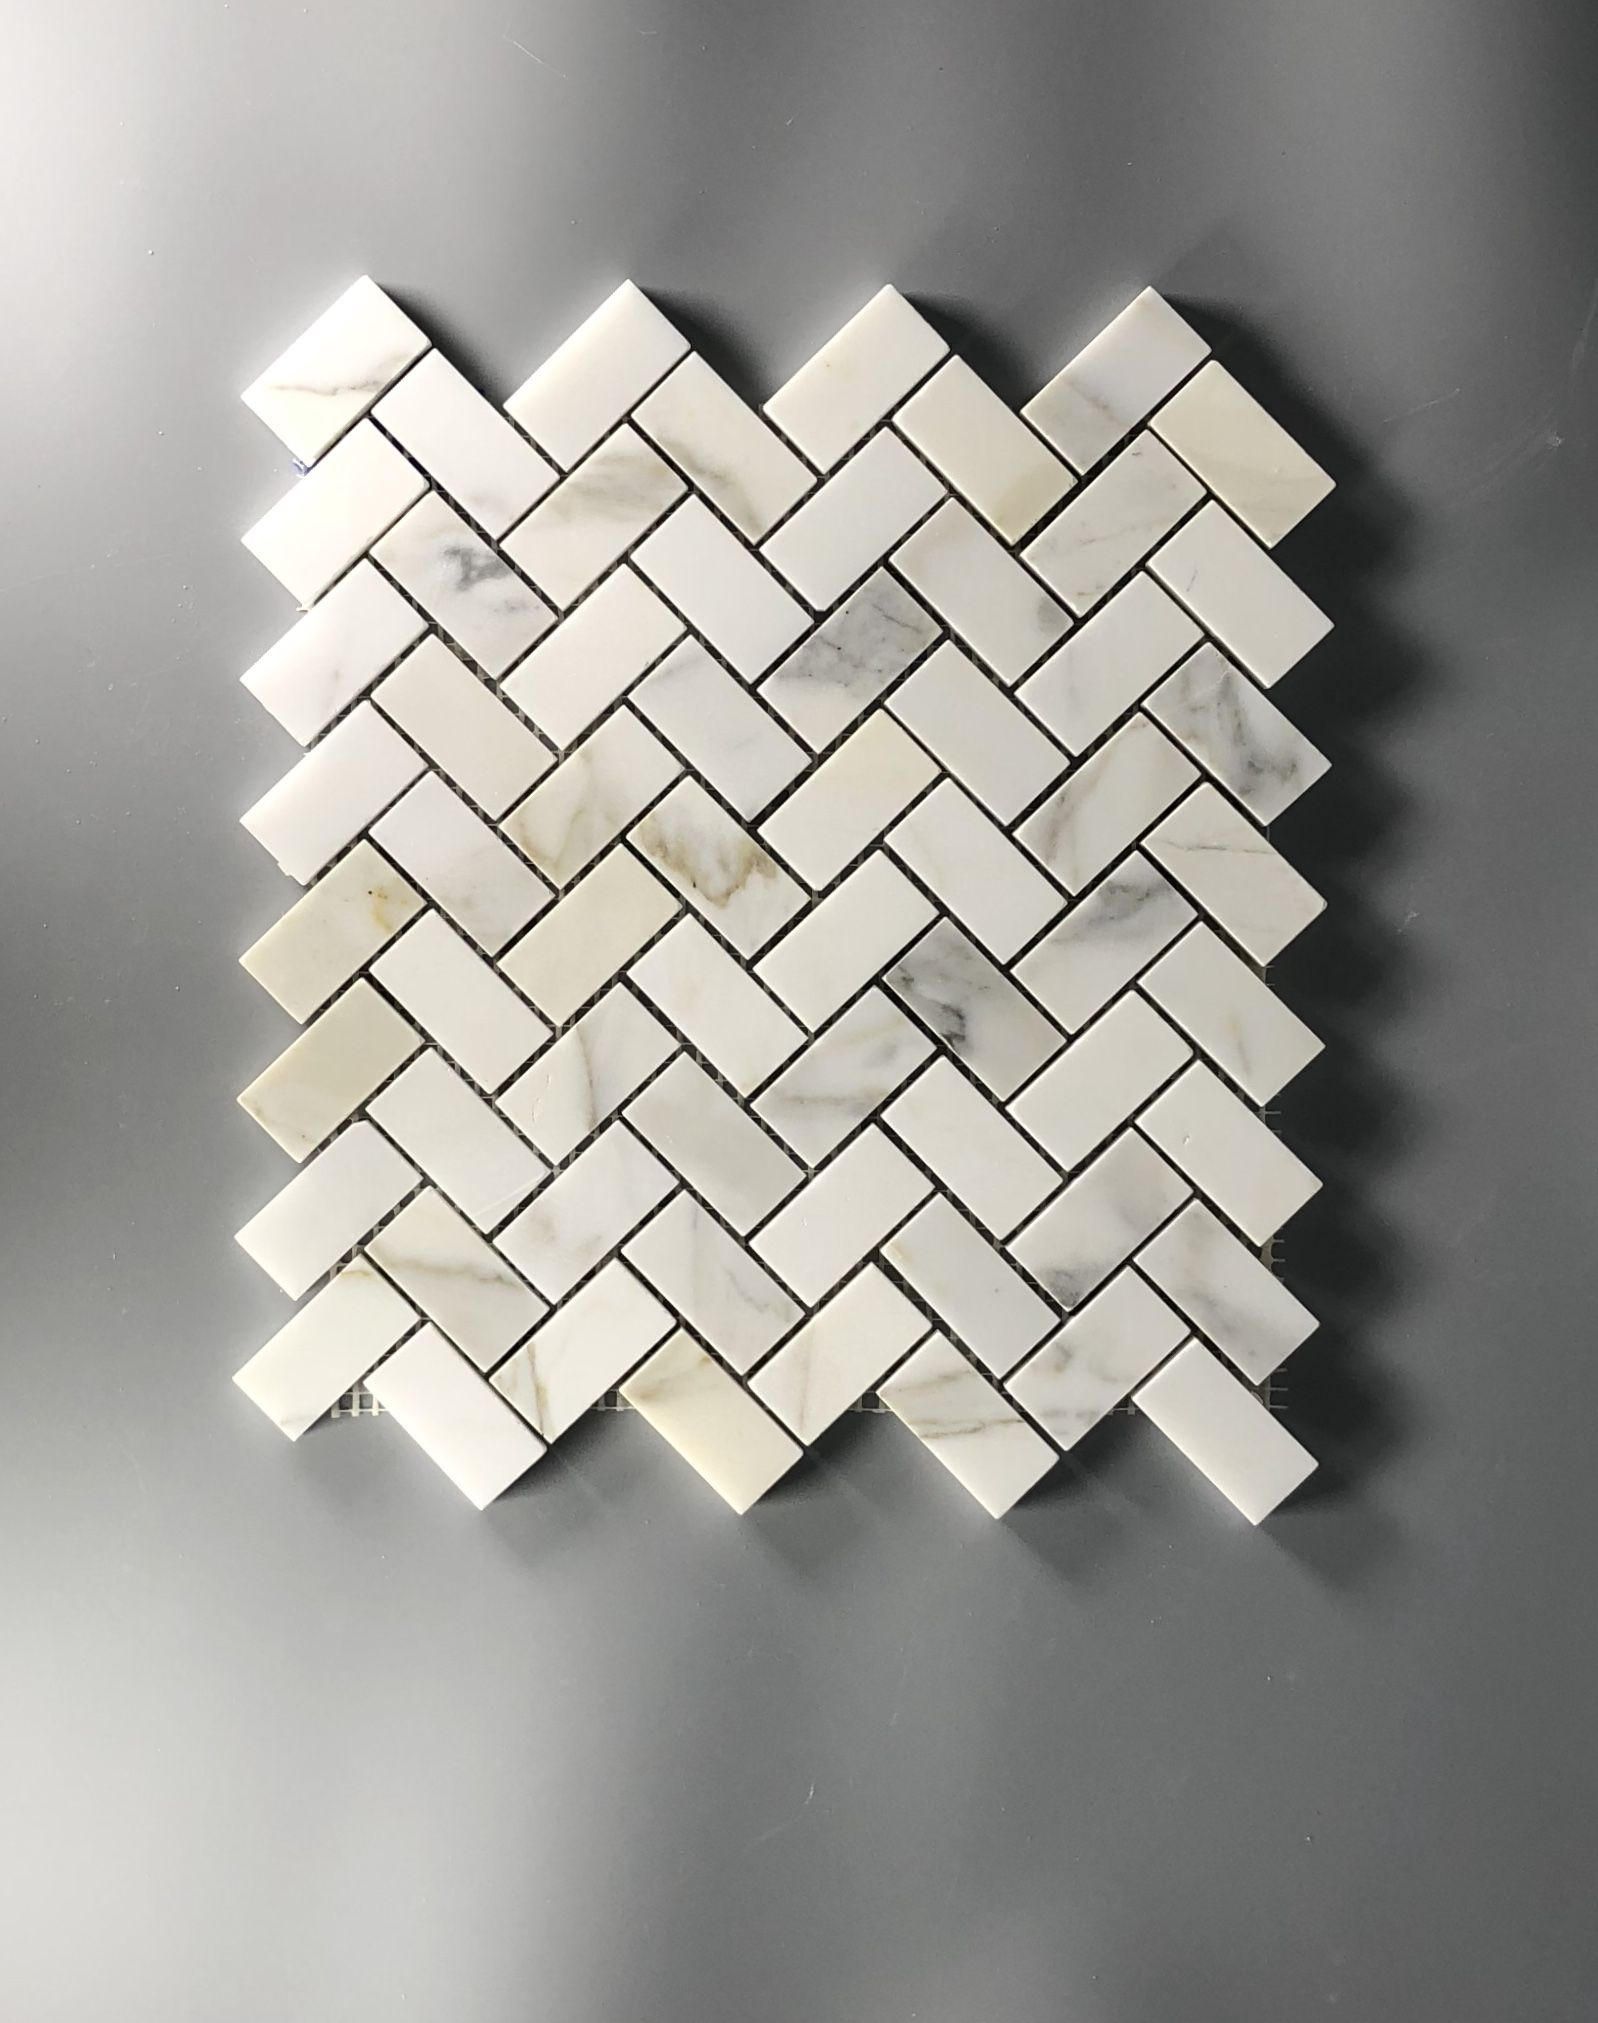 Herringbone tile https bar myshopify com products calcutta gold marble mosaic bathroom floor kitchen backsplashhttps www tilebuys also best designer white  grey images on pinterest